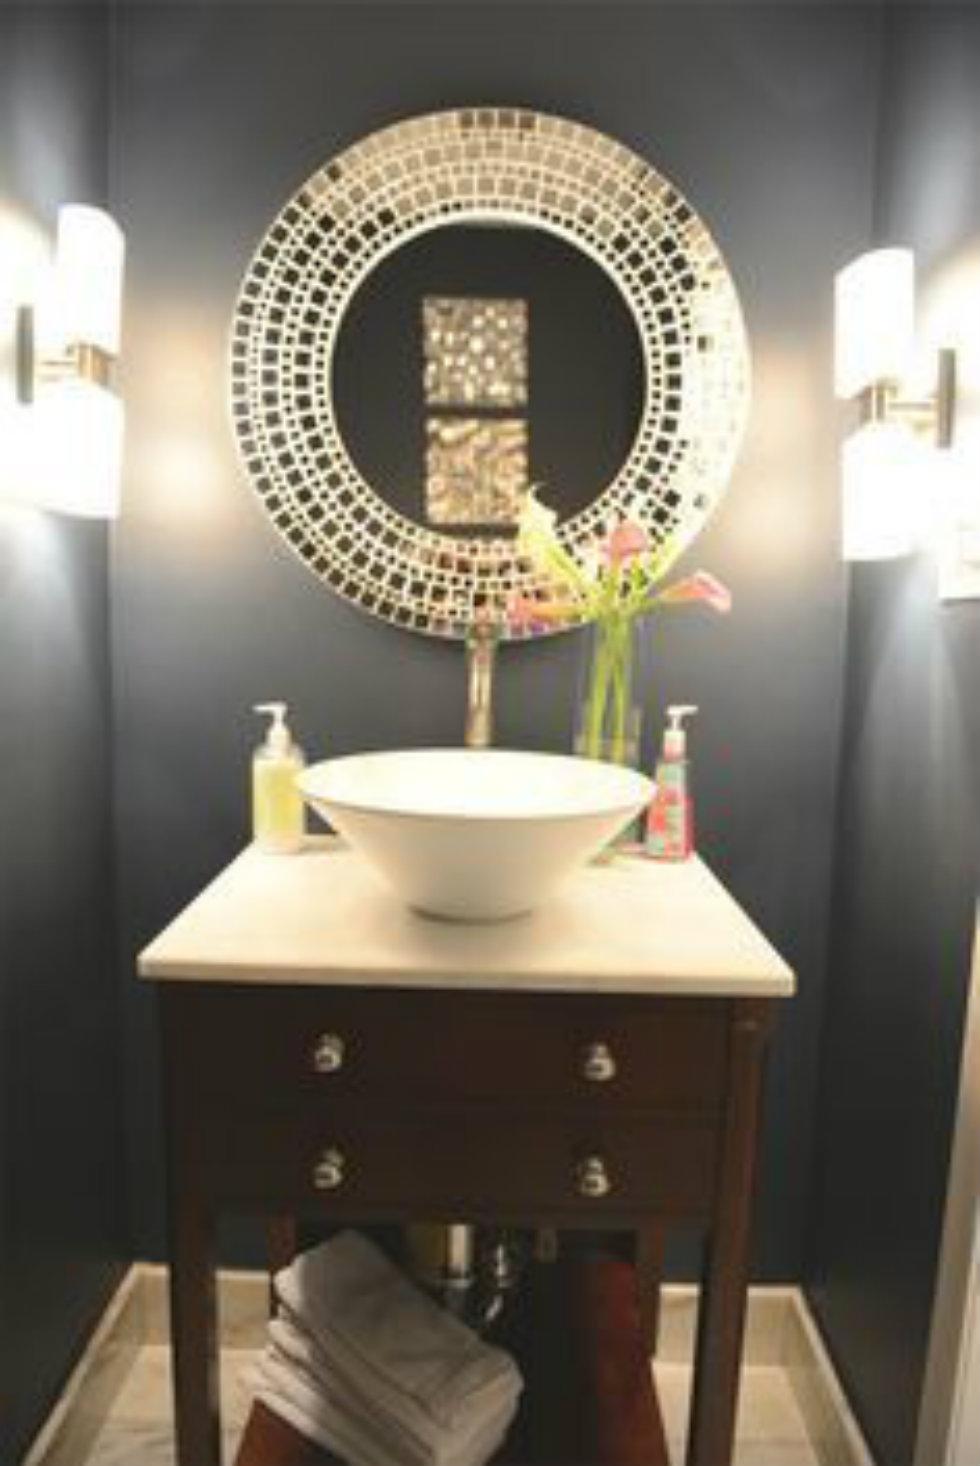 Bathroom Lighting Nyc inspiring bathroom lighting for your nyc apartment | lighting